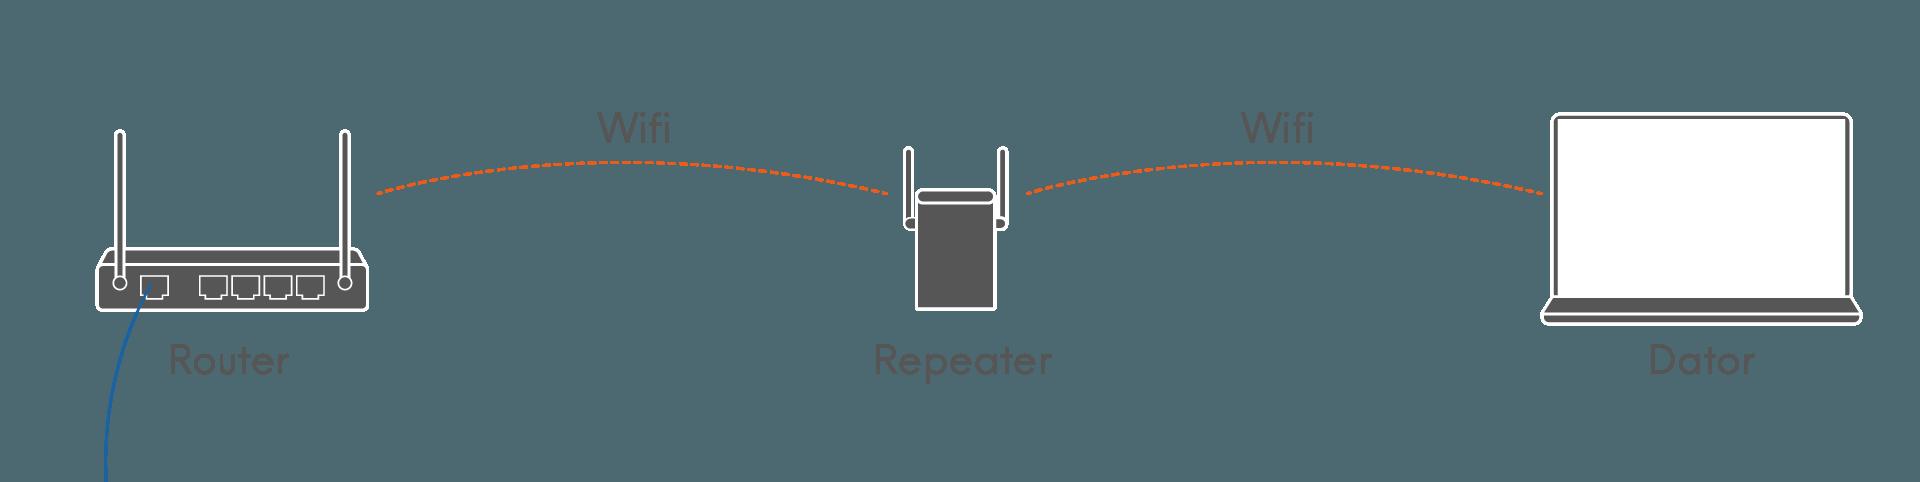 En wifi-förlängande repeater